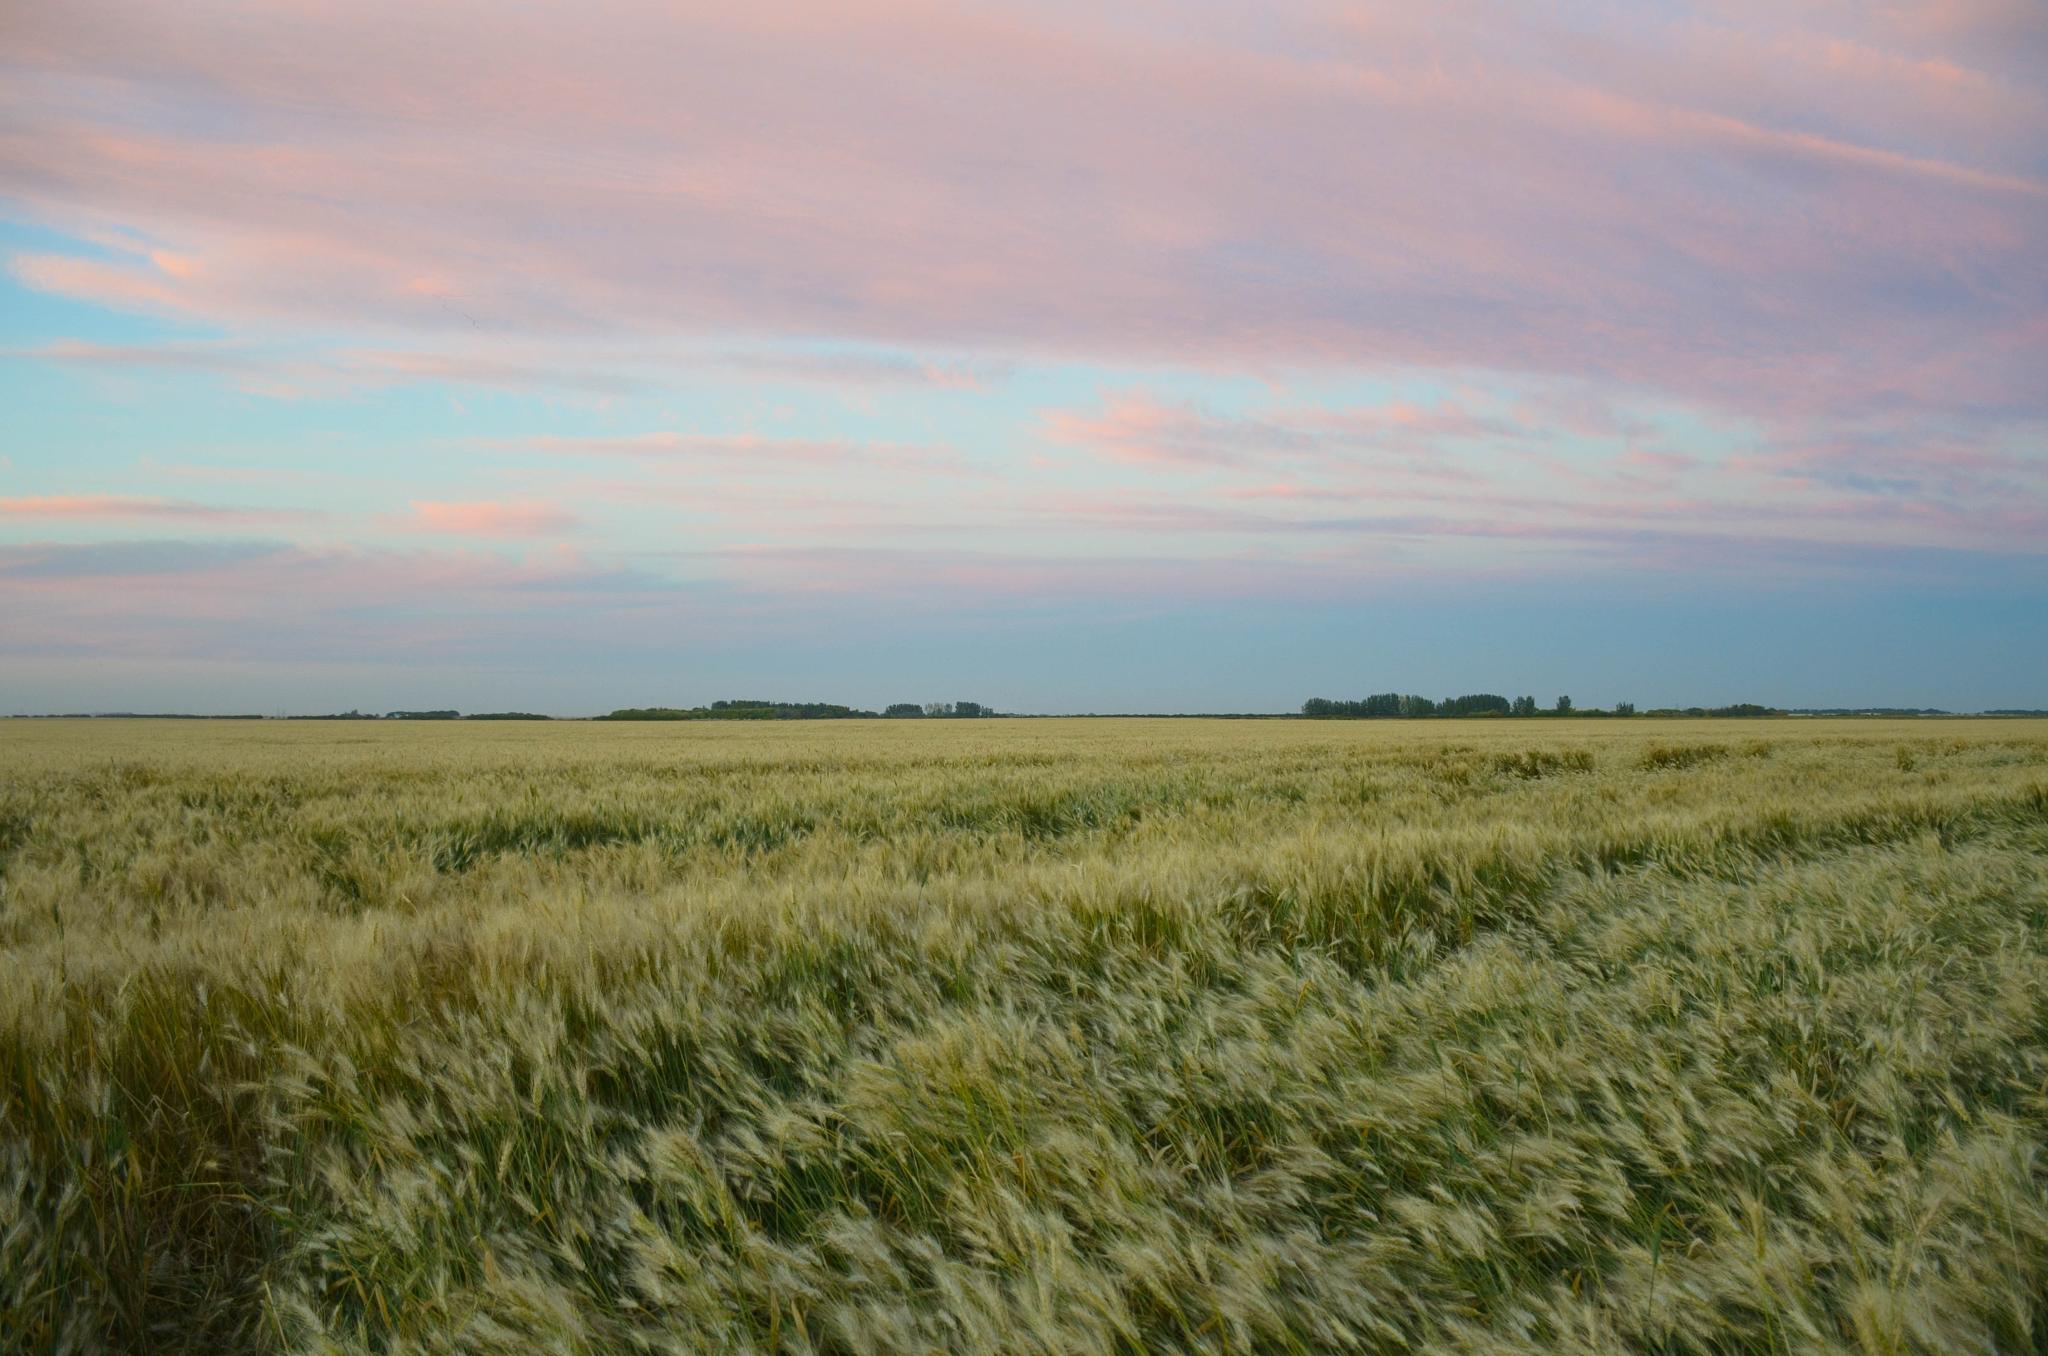 Saskatchewan at Dusk by Ang Klassen